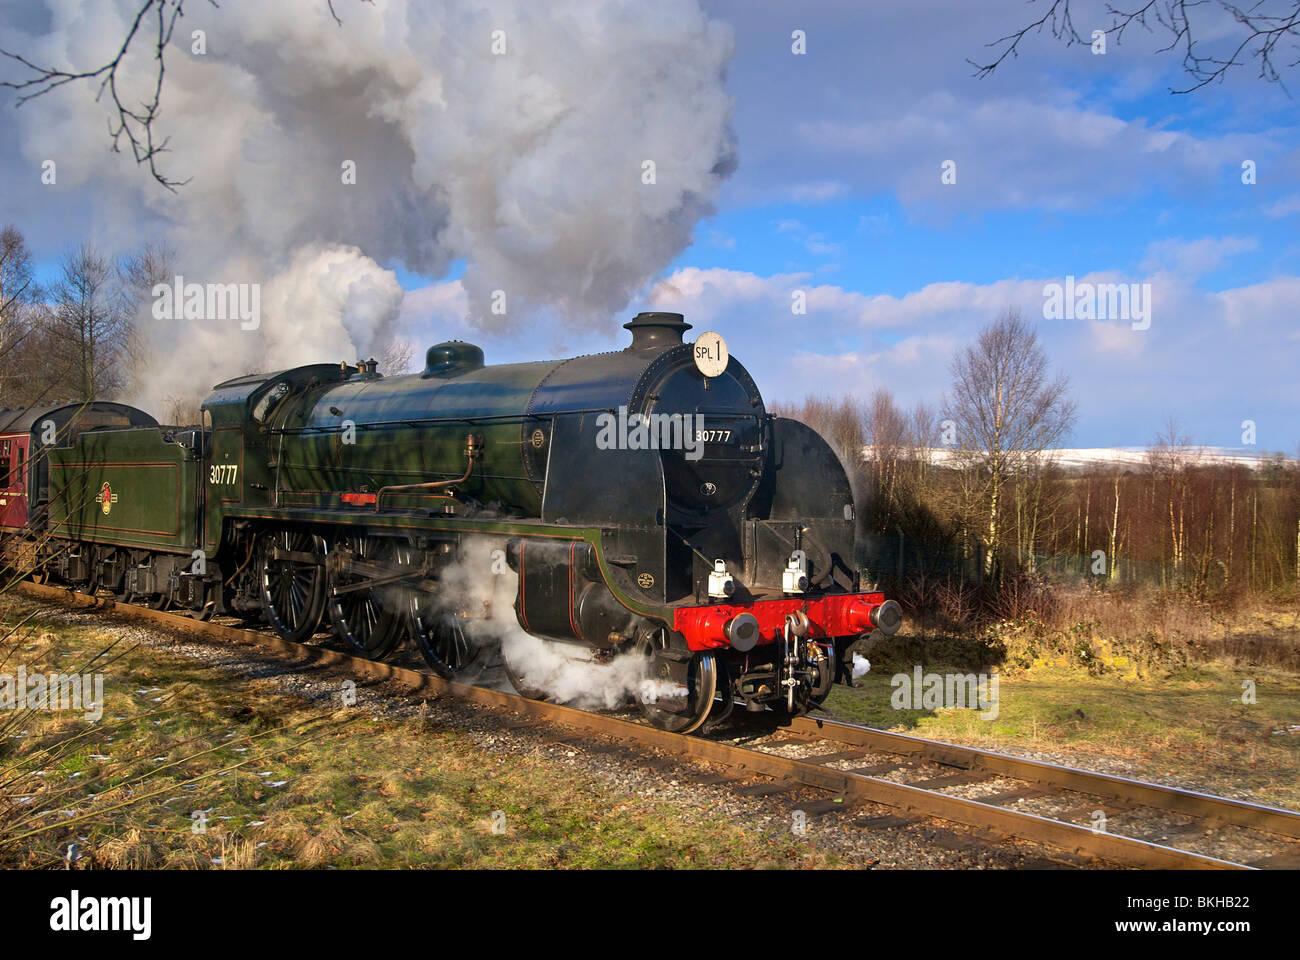 Southern Railway 'King Arthur' Class 30777 Sir Lamiel seen on the East Lancashire Heritage Railway based at Bury - Stock Image